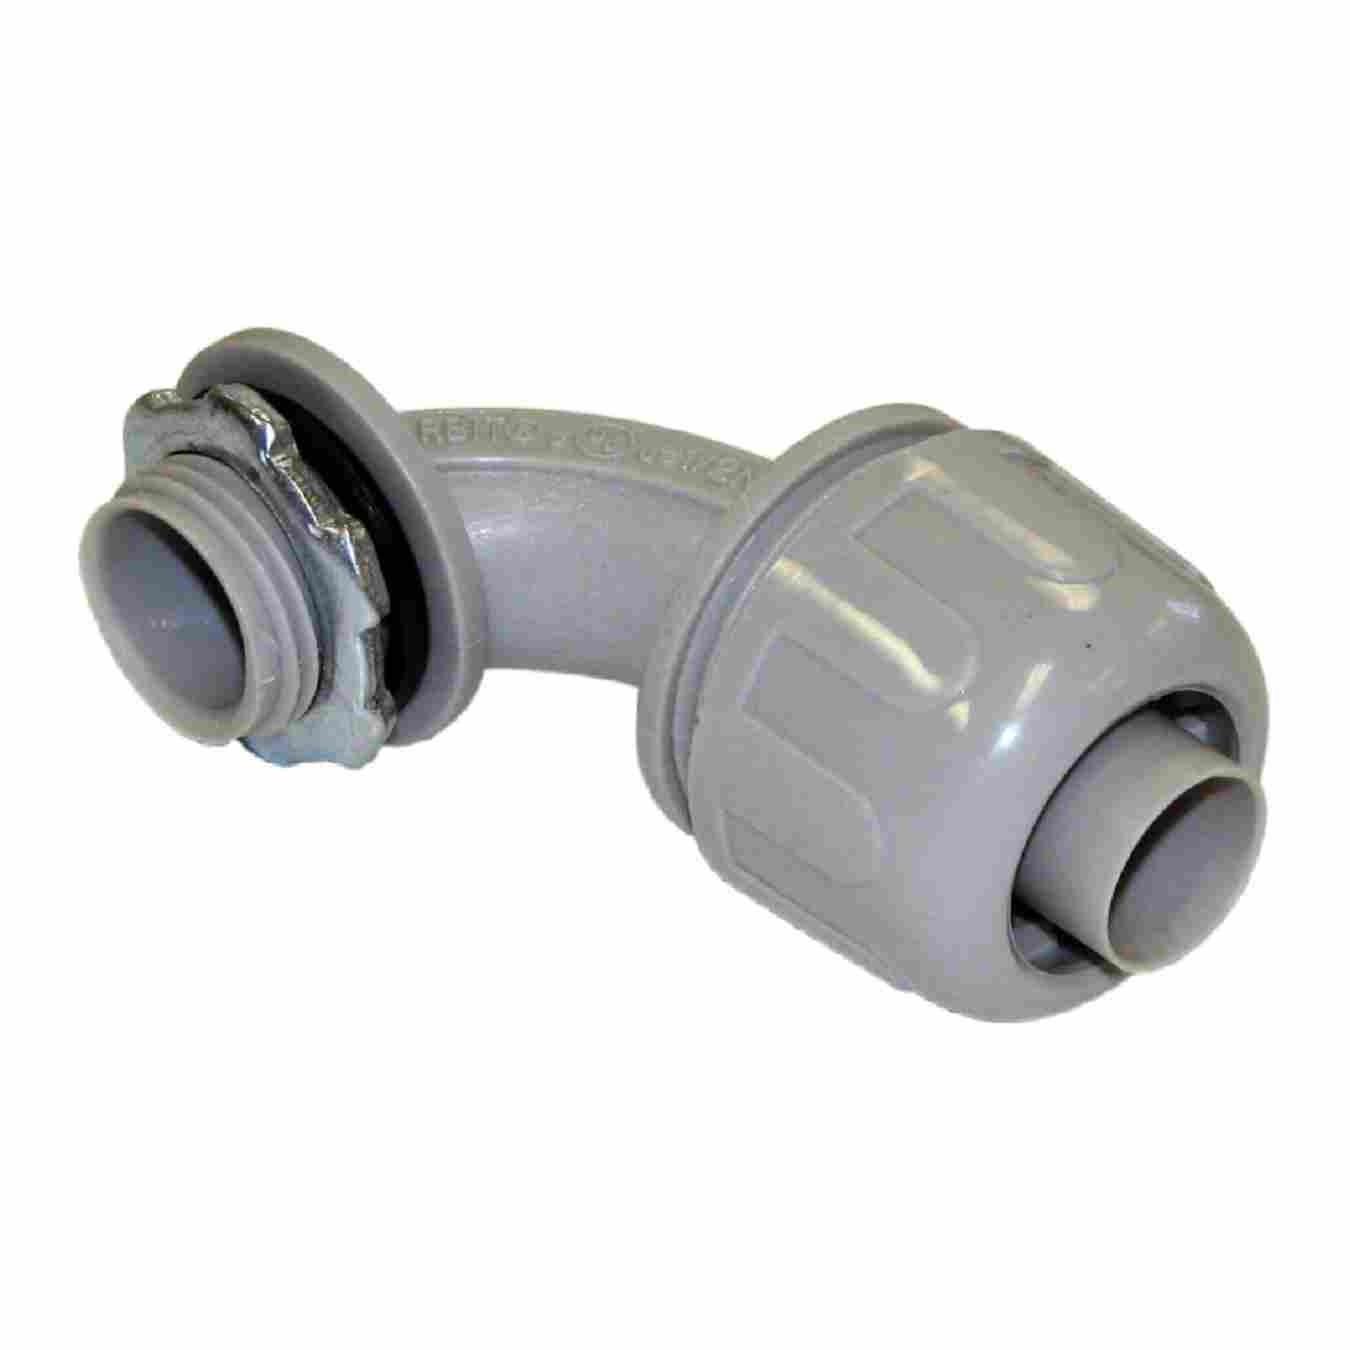 NON-METALLIC (PVC) LIQUID TIGHT CONNECTORS 90° ANGLE